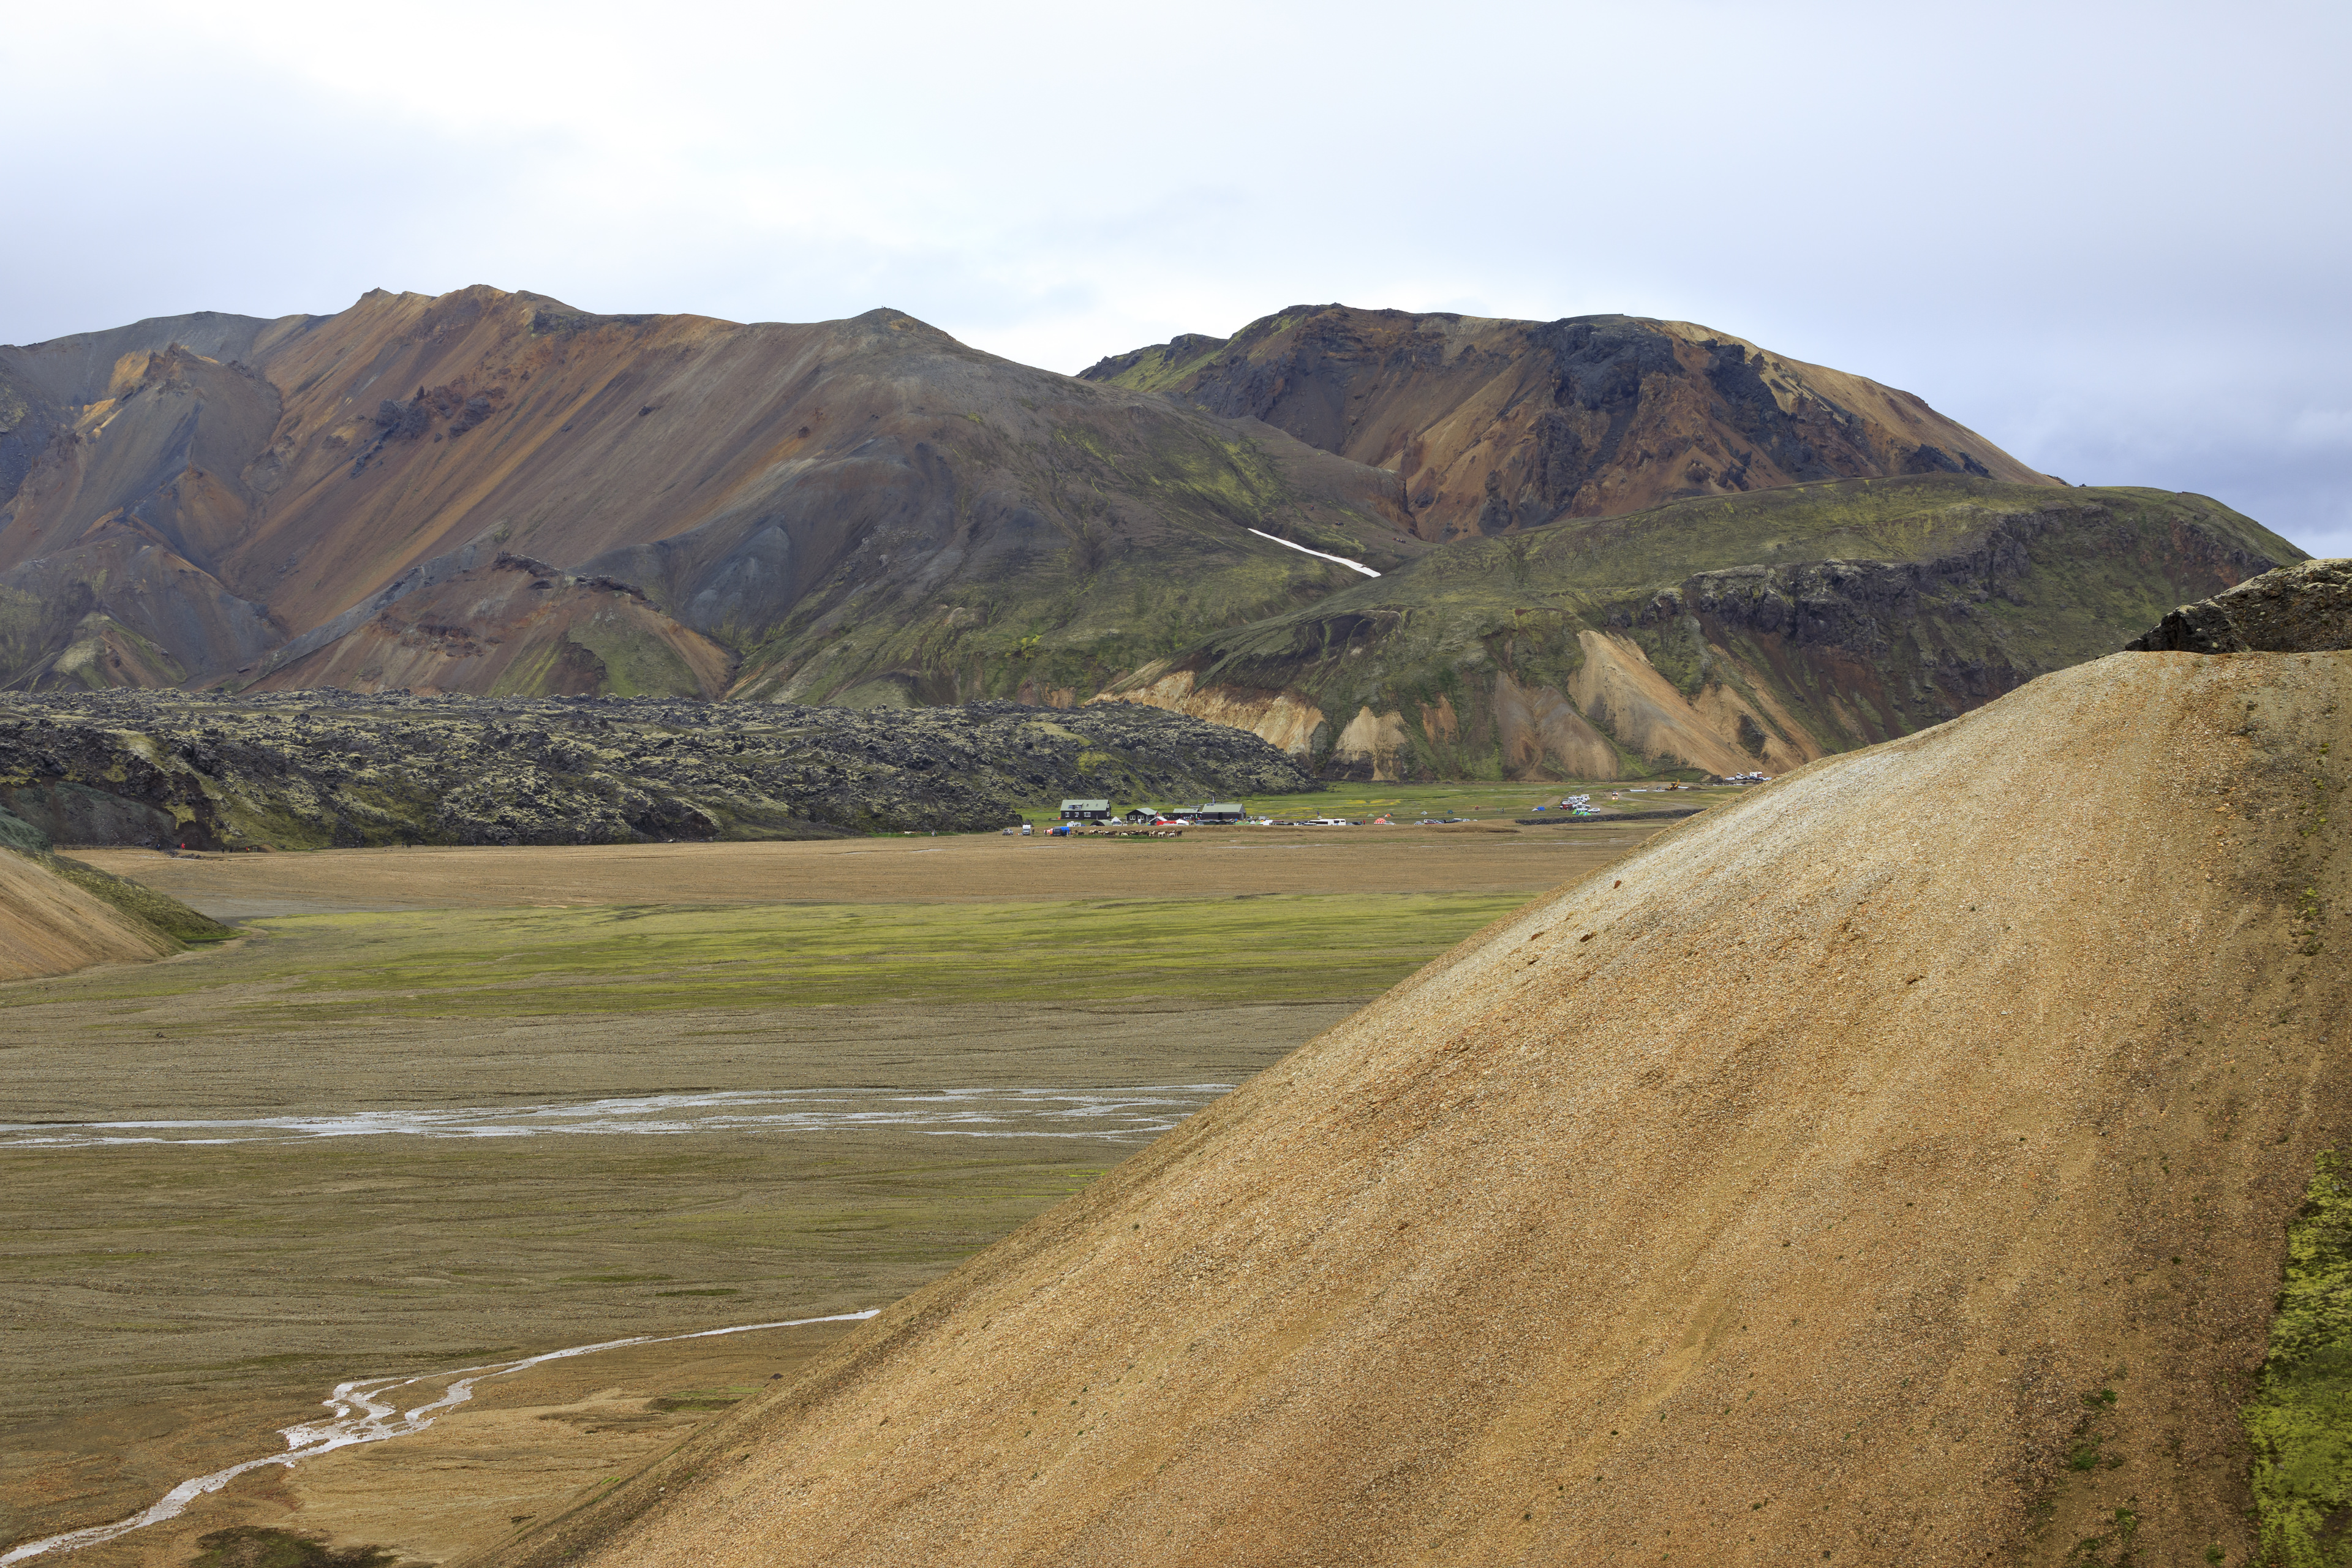 Lavafeld Laugahraun, Camp Landmannalaugar und im Hintergrund Suðurnámur,©Markus Proske—Canon EOS 5D Mark IV, EF70-300mm f/4-5.6L IS USM, 70mm, 1/250s, Blende 8, ISO 200